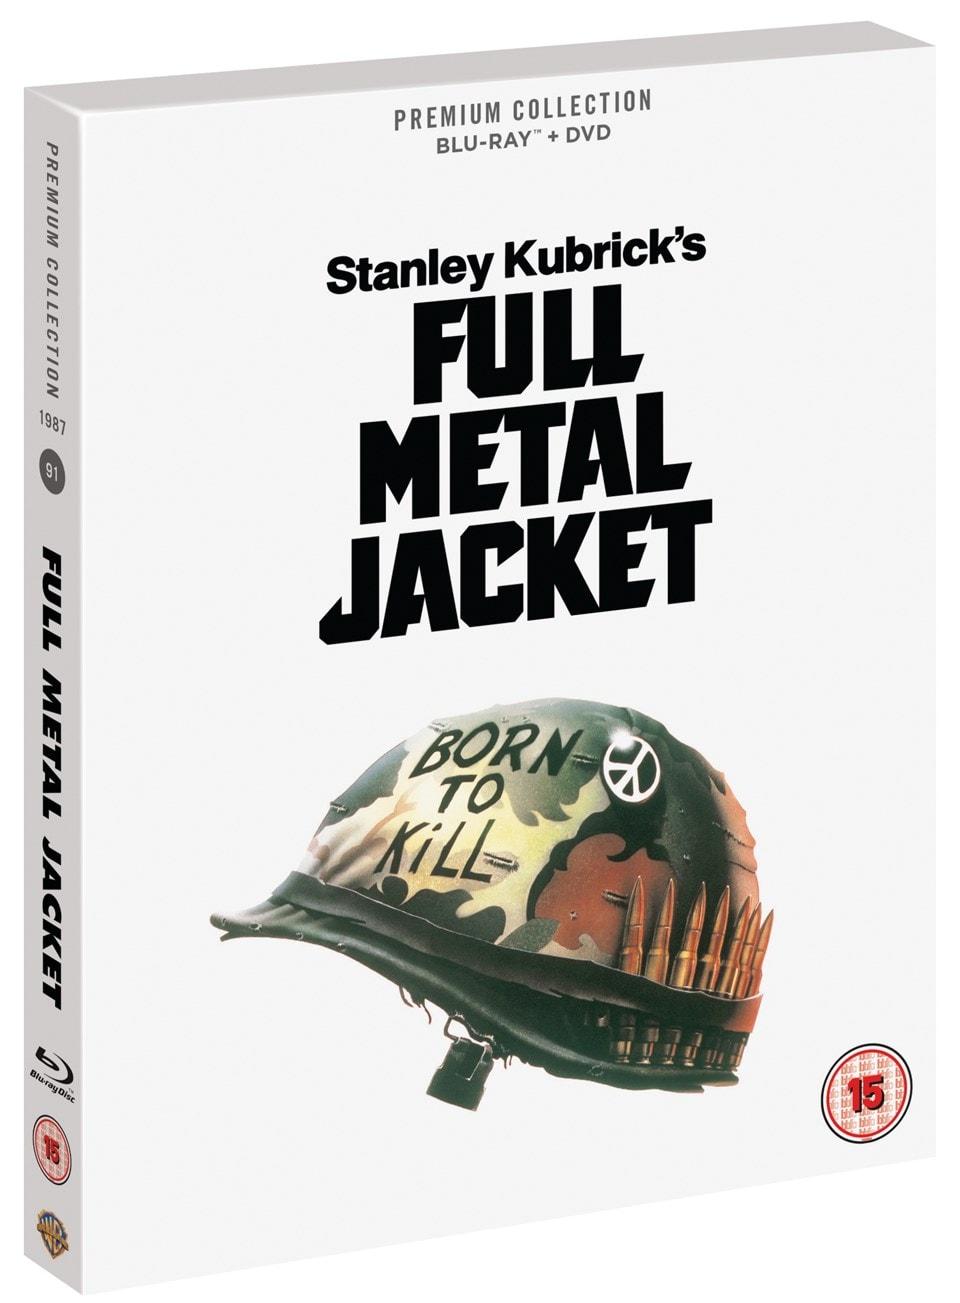 Full Metal Jacket (hmv Exclusive) - The Premium Collection - 2